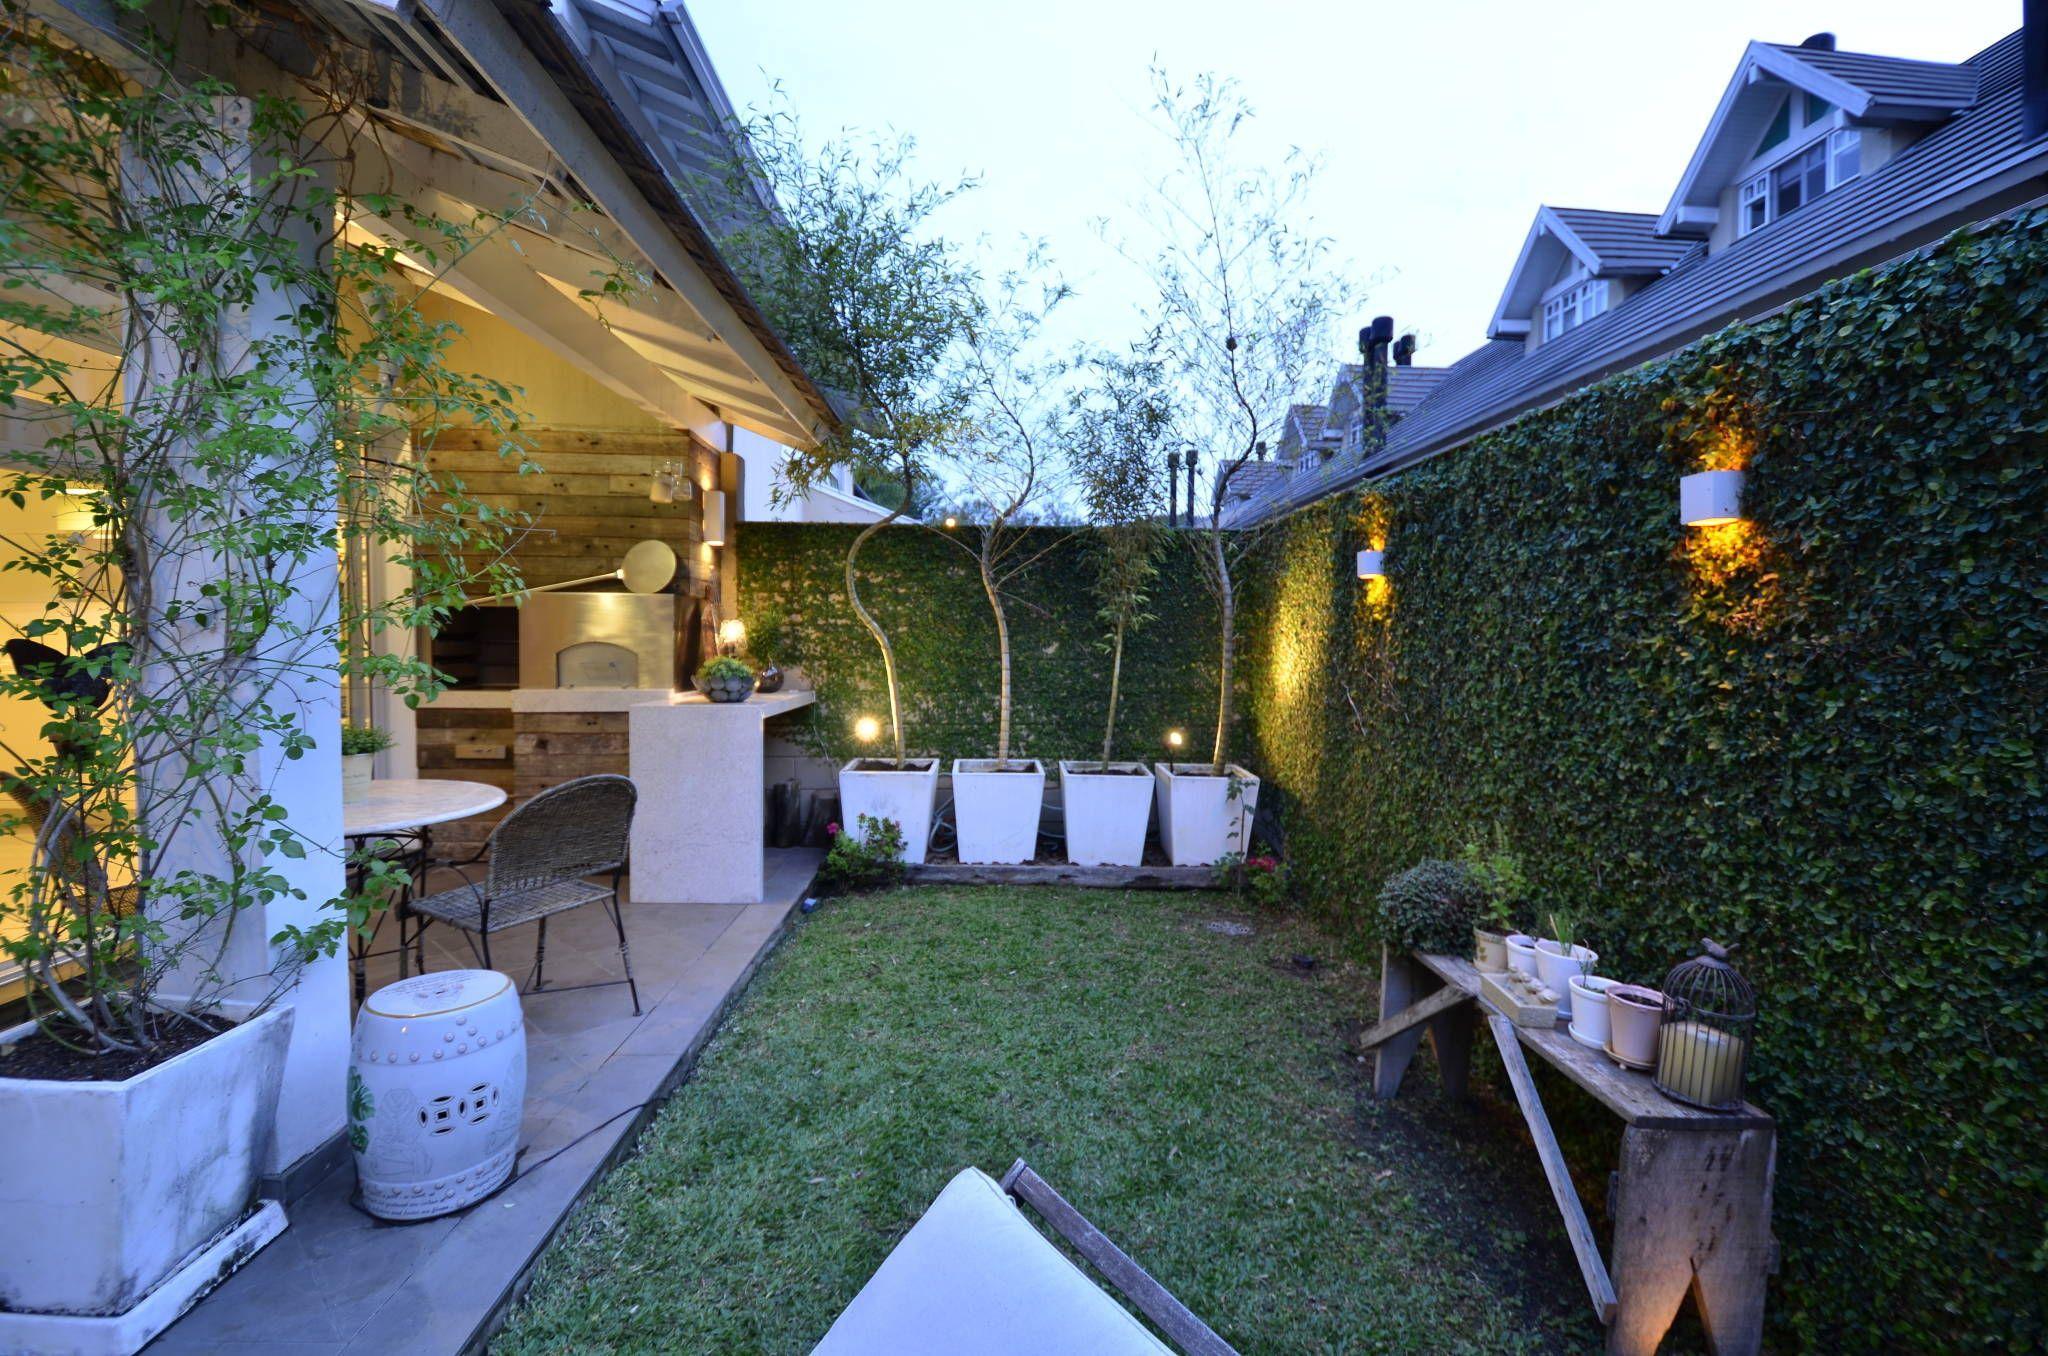 Moderner Garten Bilder von Tania Bertolucci de Souza